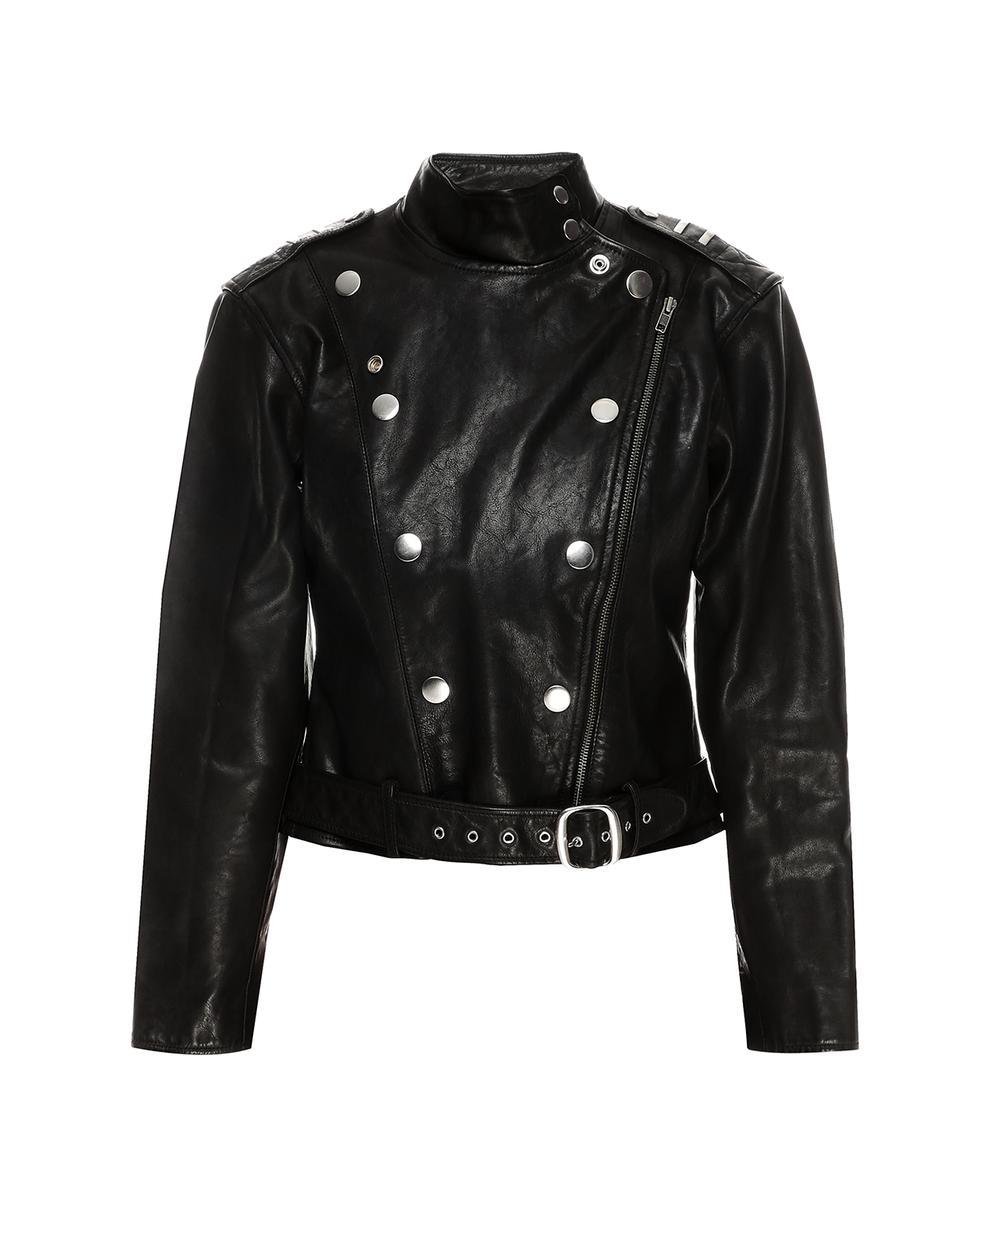 Кожаная куртка Polo Ralph Lauren 211800771001 — Kameron